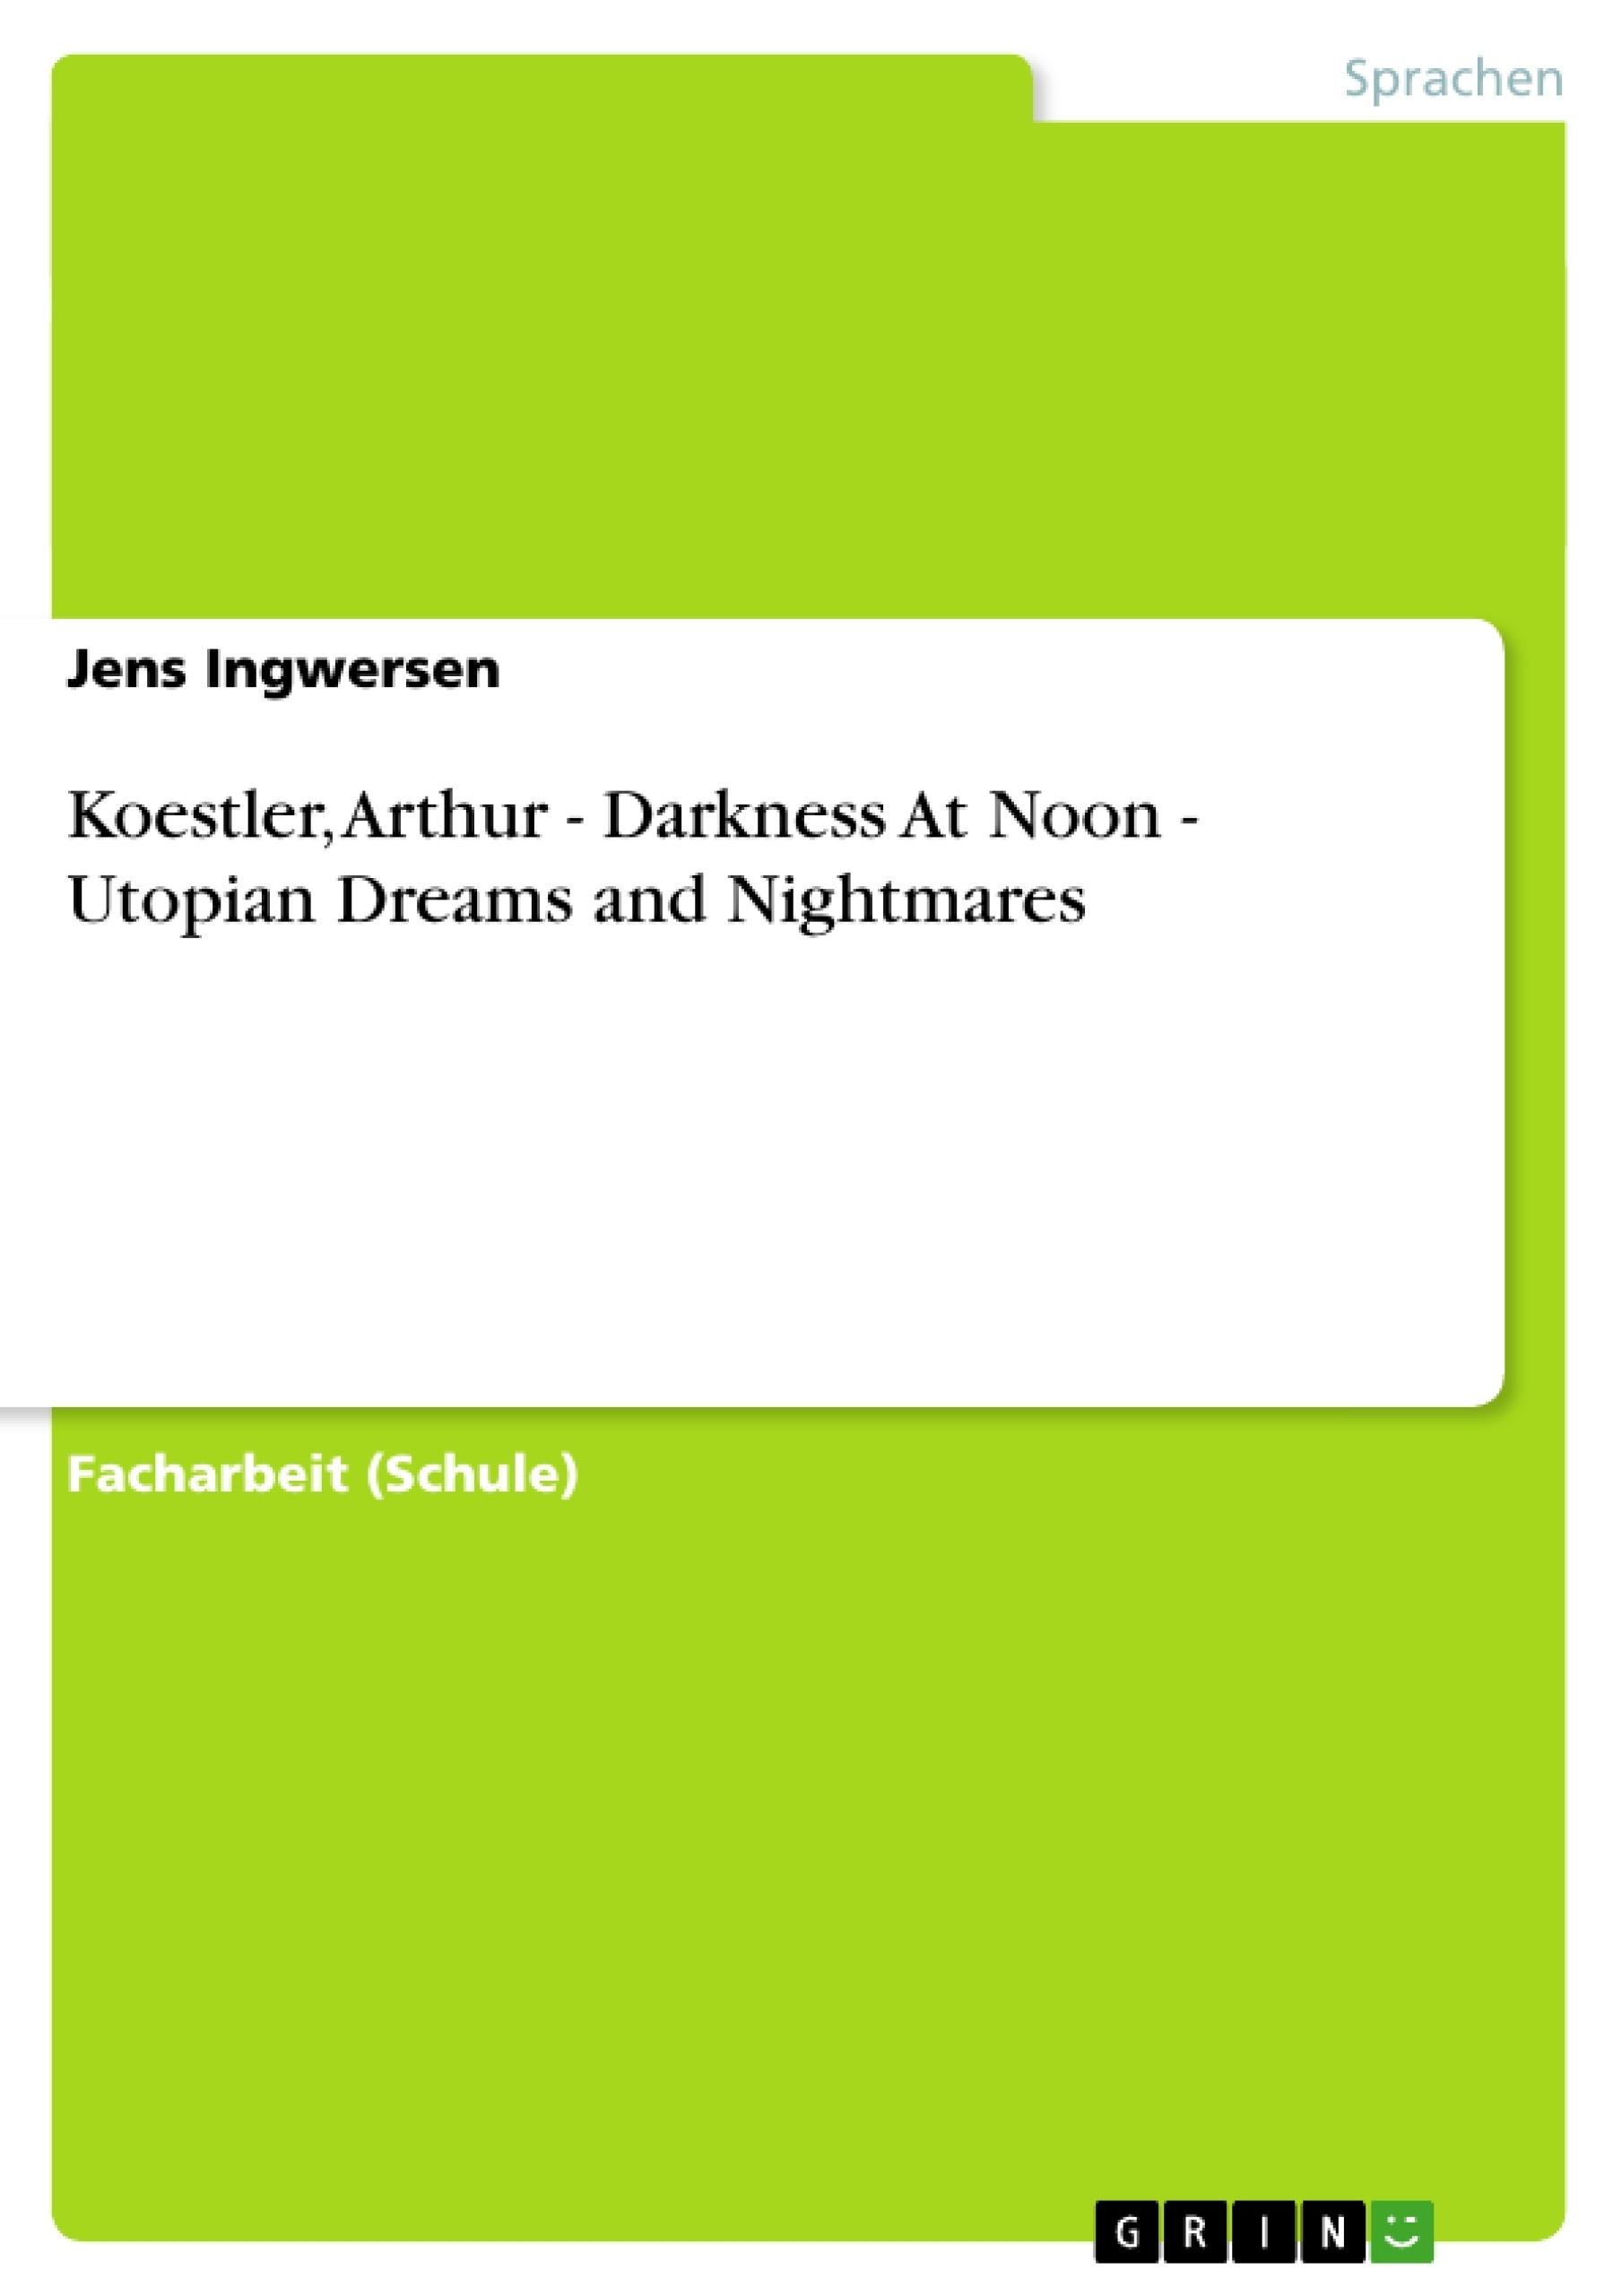 Titel: Koestler, Arthur - Darkness At Noon - Utopian Dreams and Nightmares